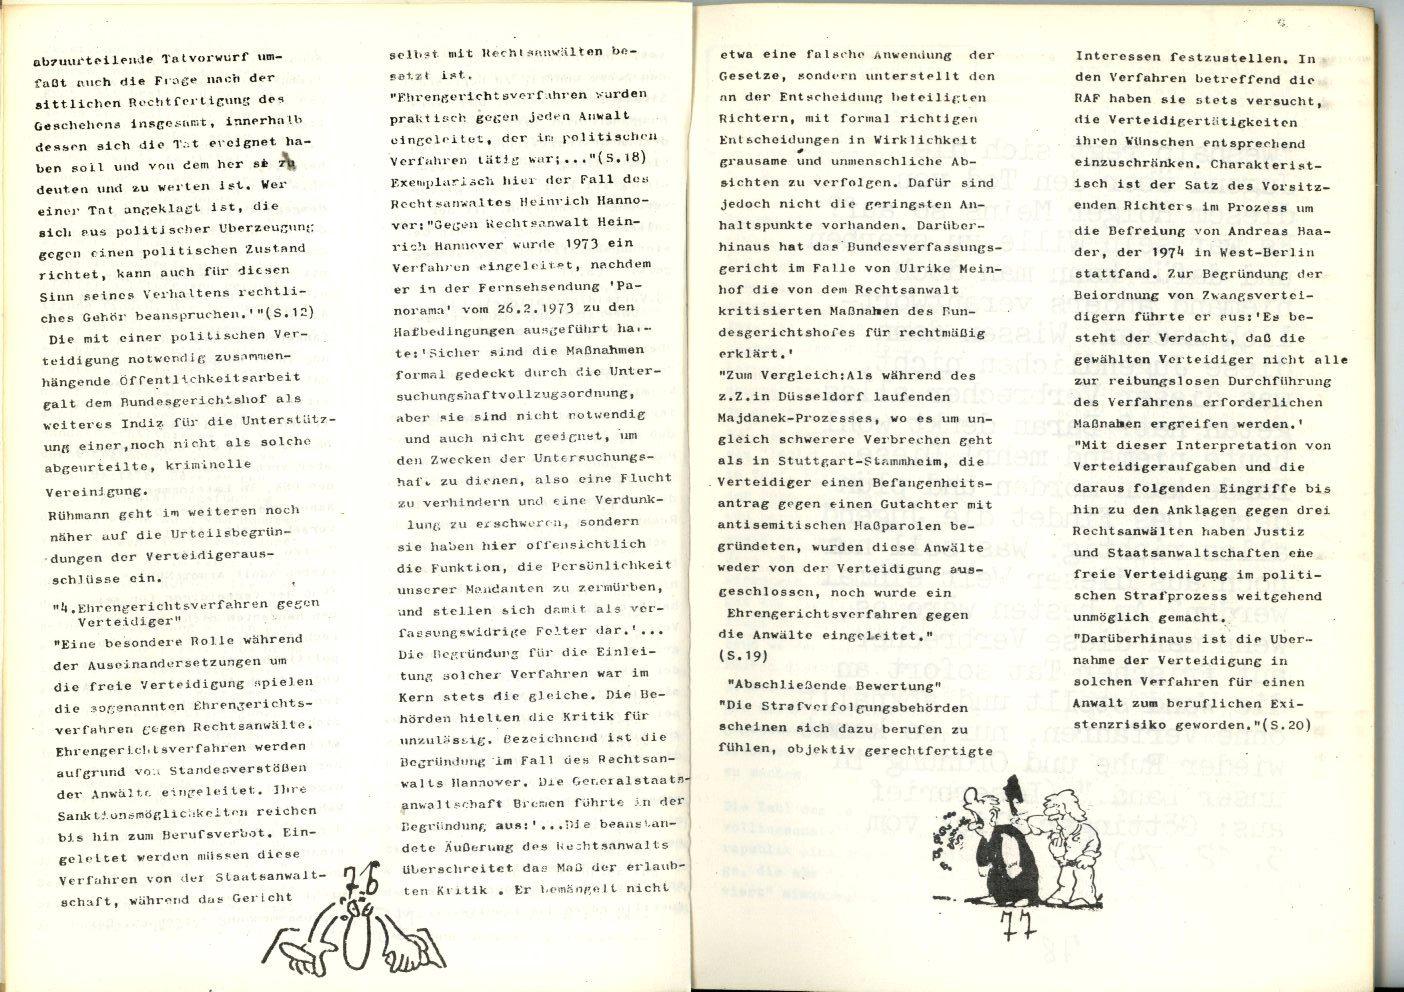 Marburg_Russell_Initiative_1978_40